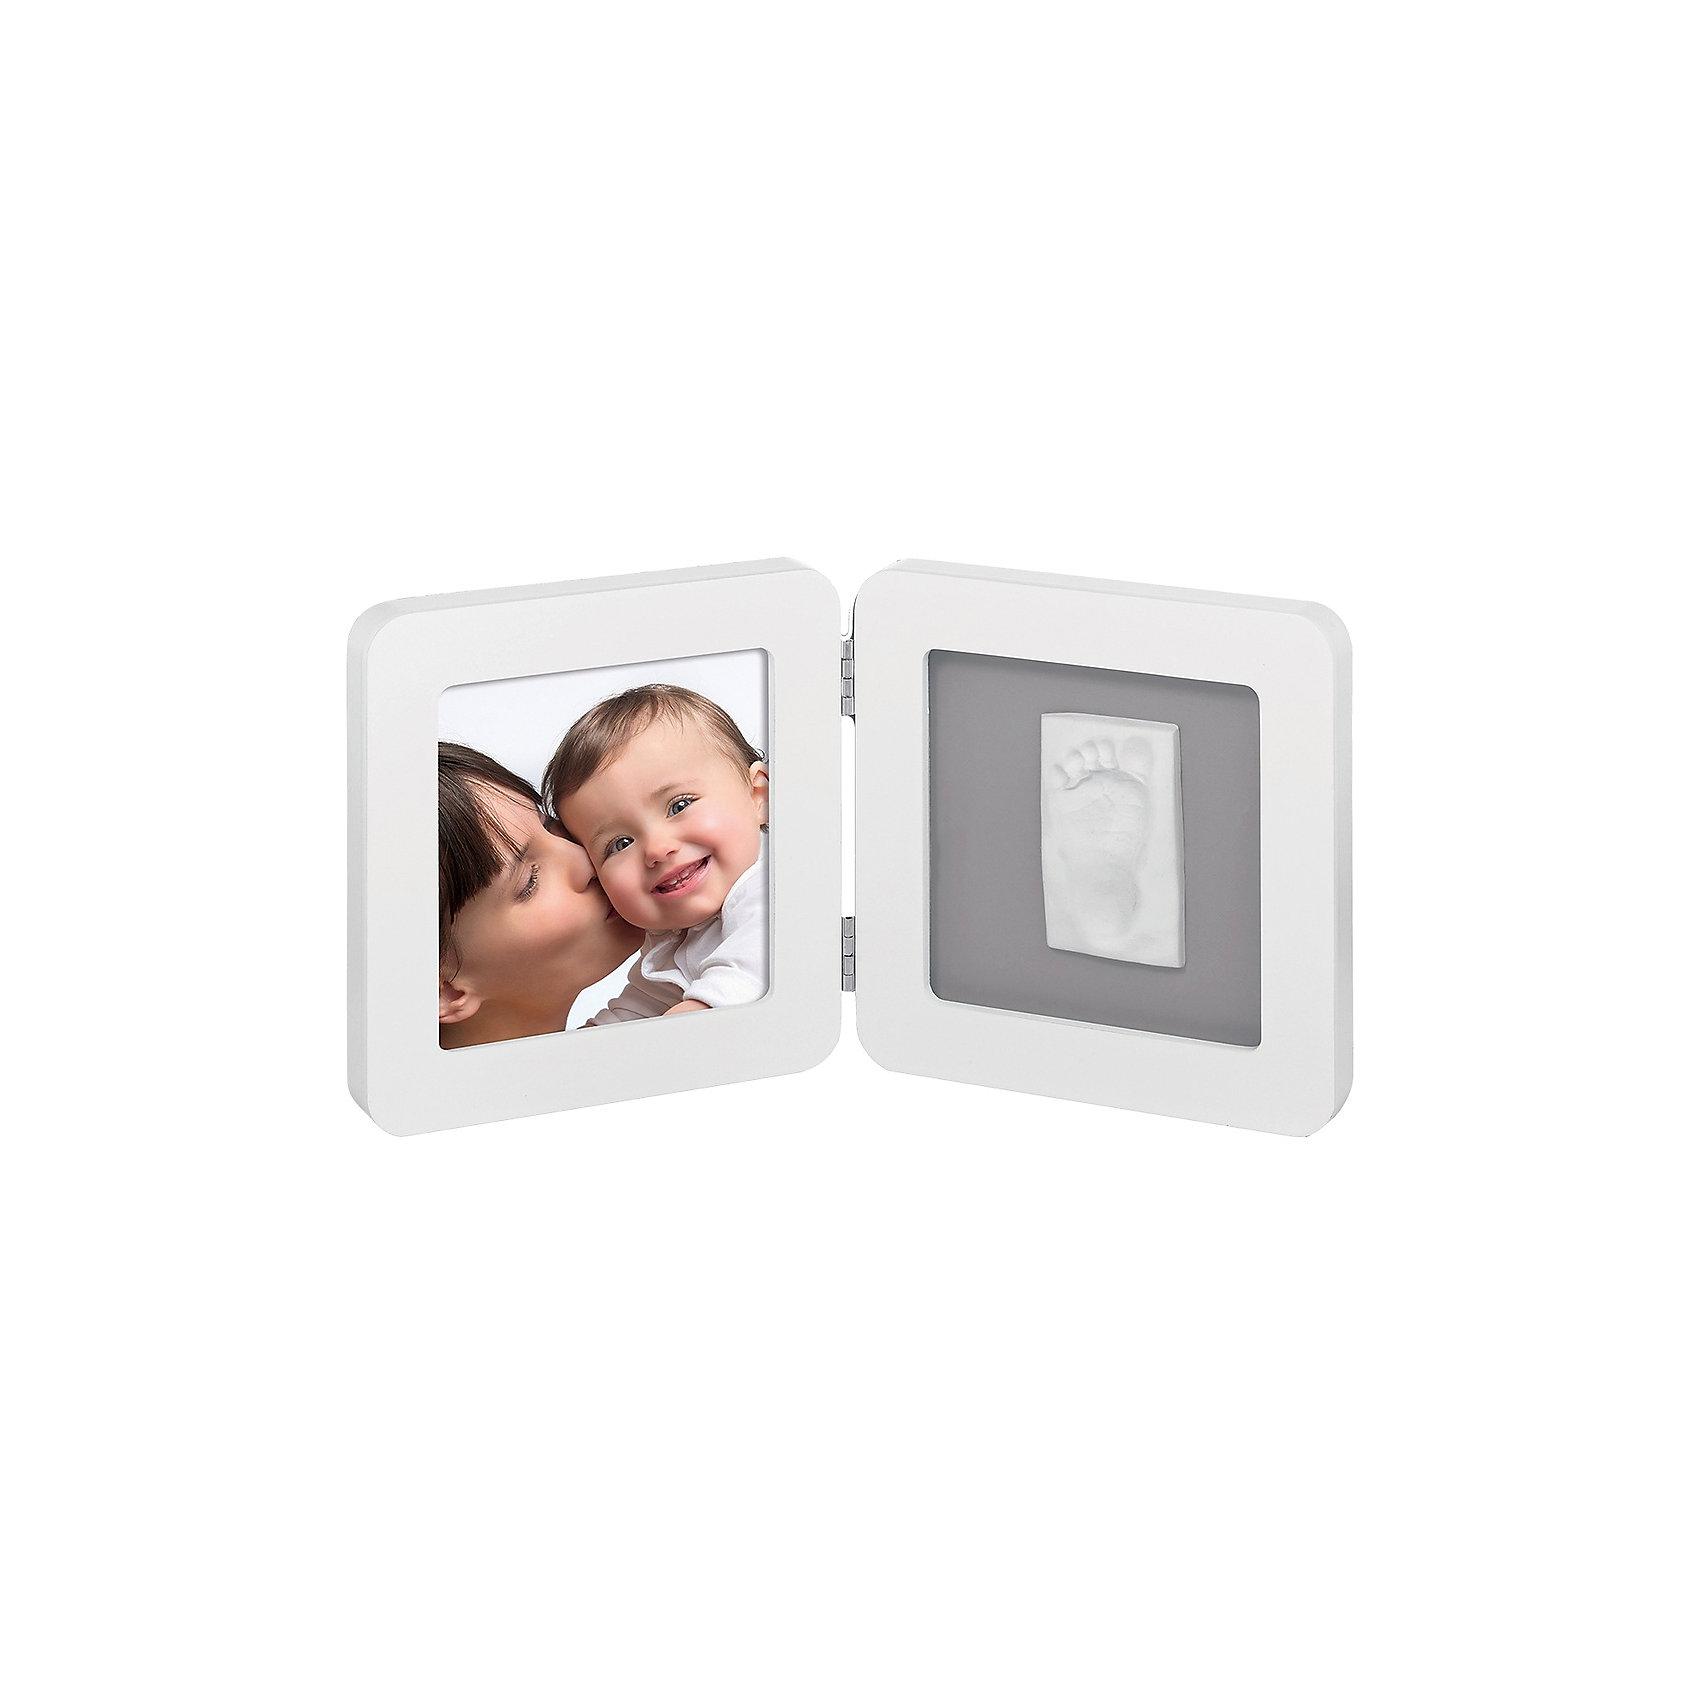 Gipsabdruck Set mit 2-tlg. Bilderrahmen white/grey